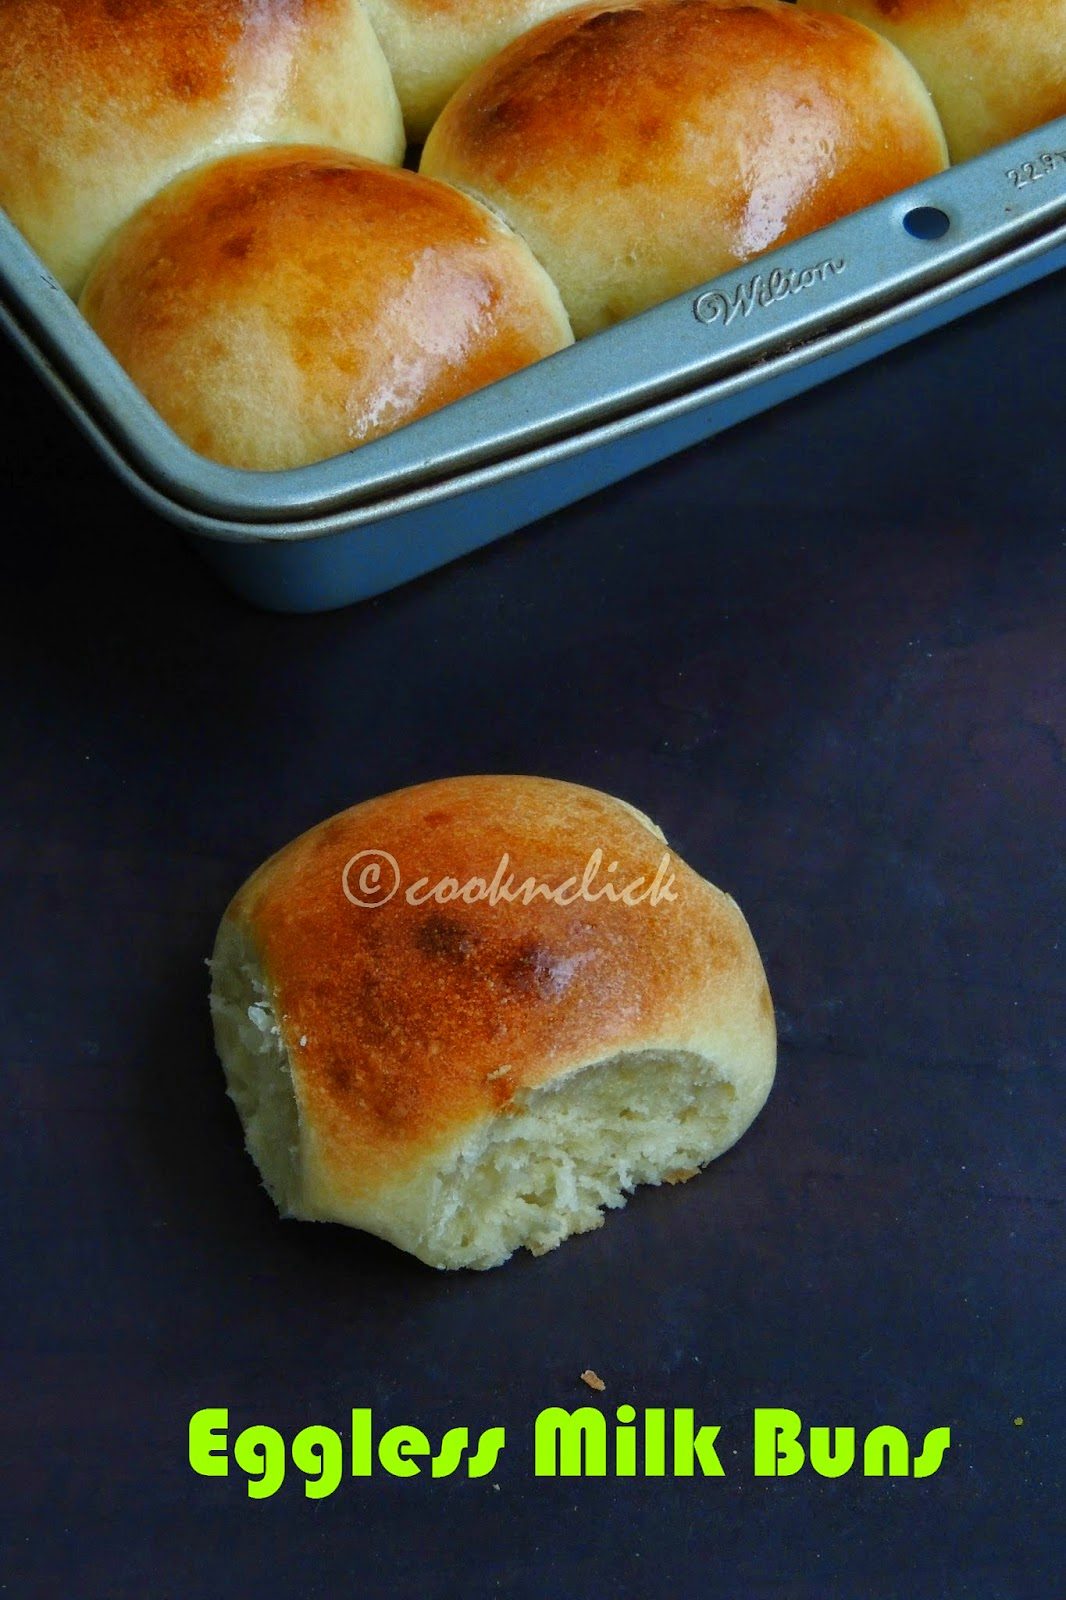 Spongy & Eggless Milk Buns